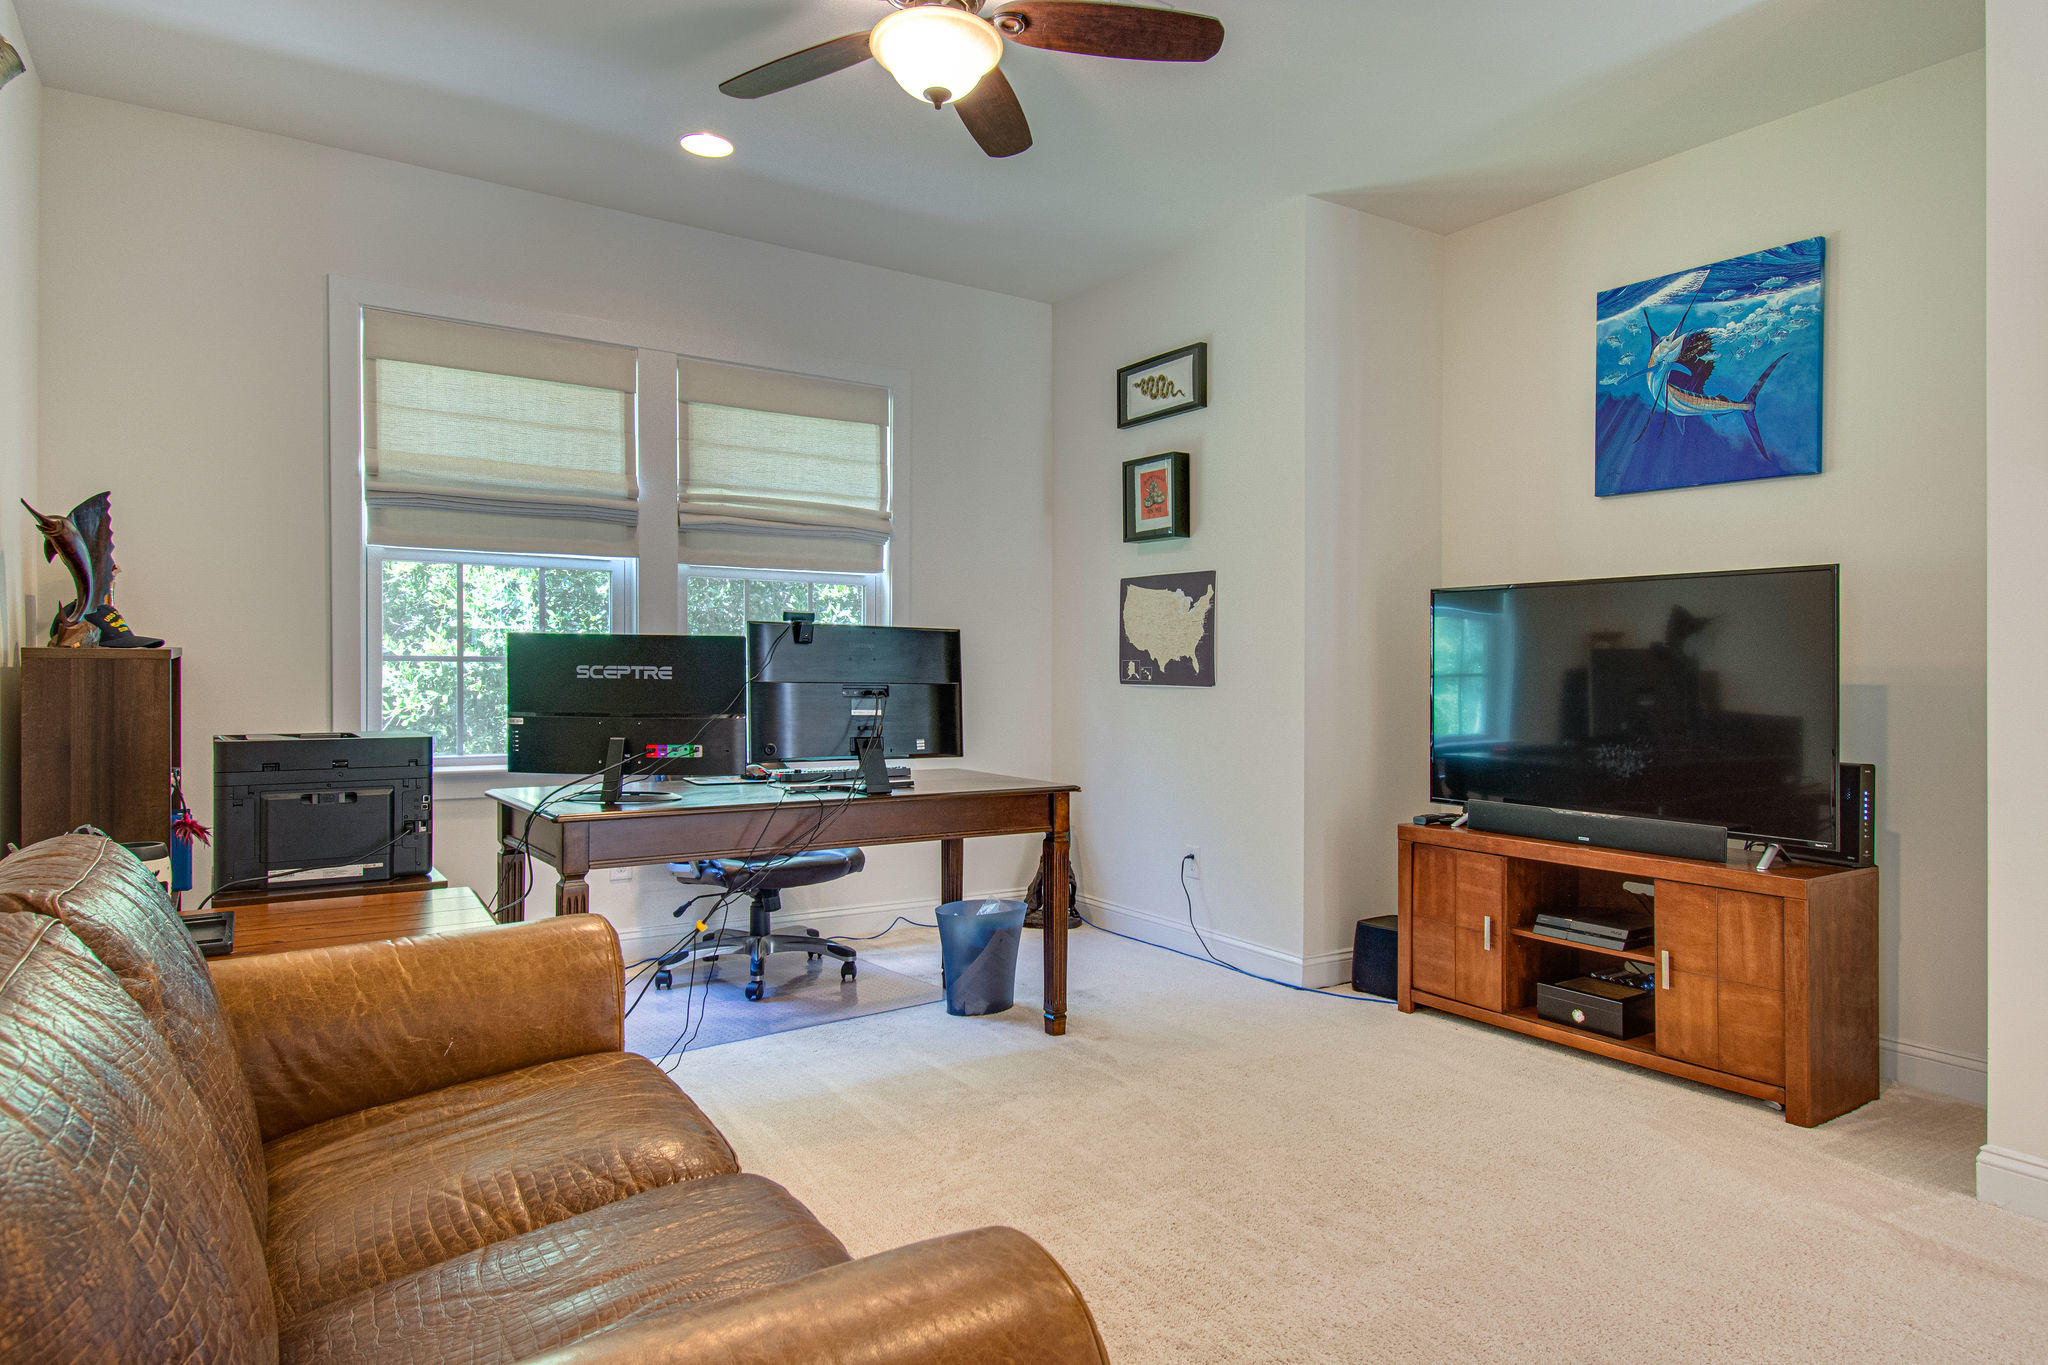 Magnolia Village Homes For Sale - 1261 Pearwood, Mount Pleasant, SC - 14